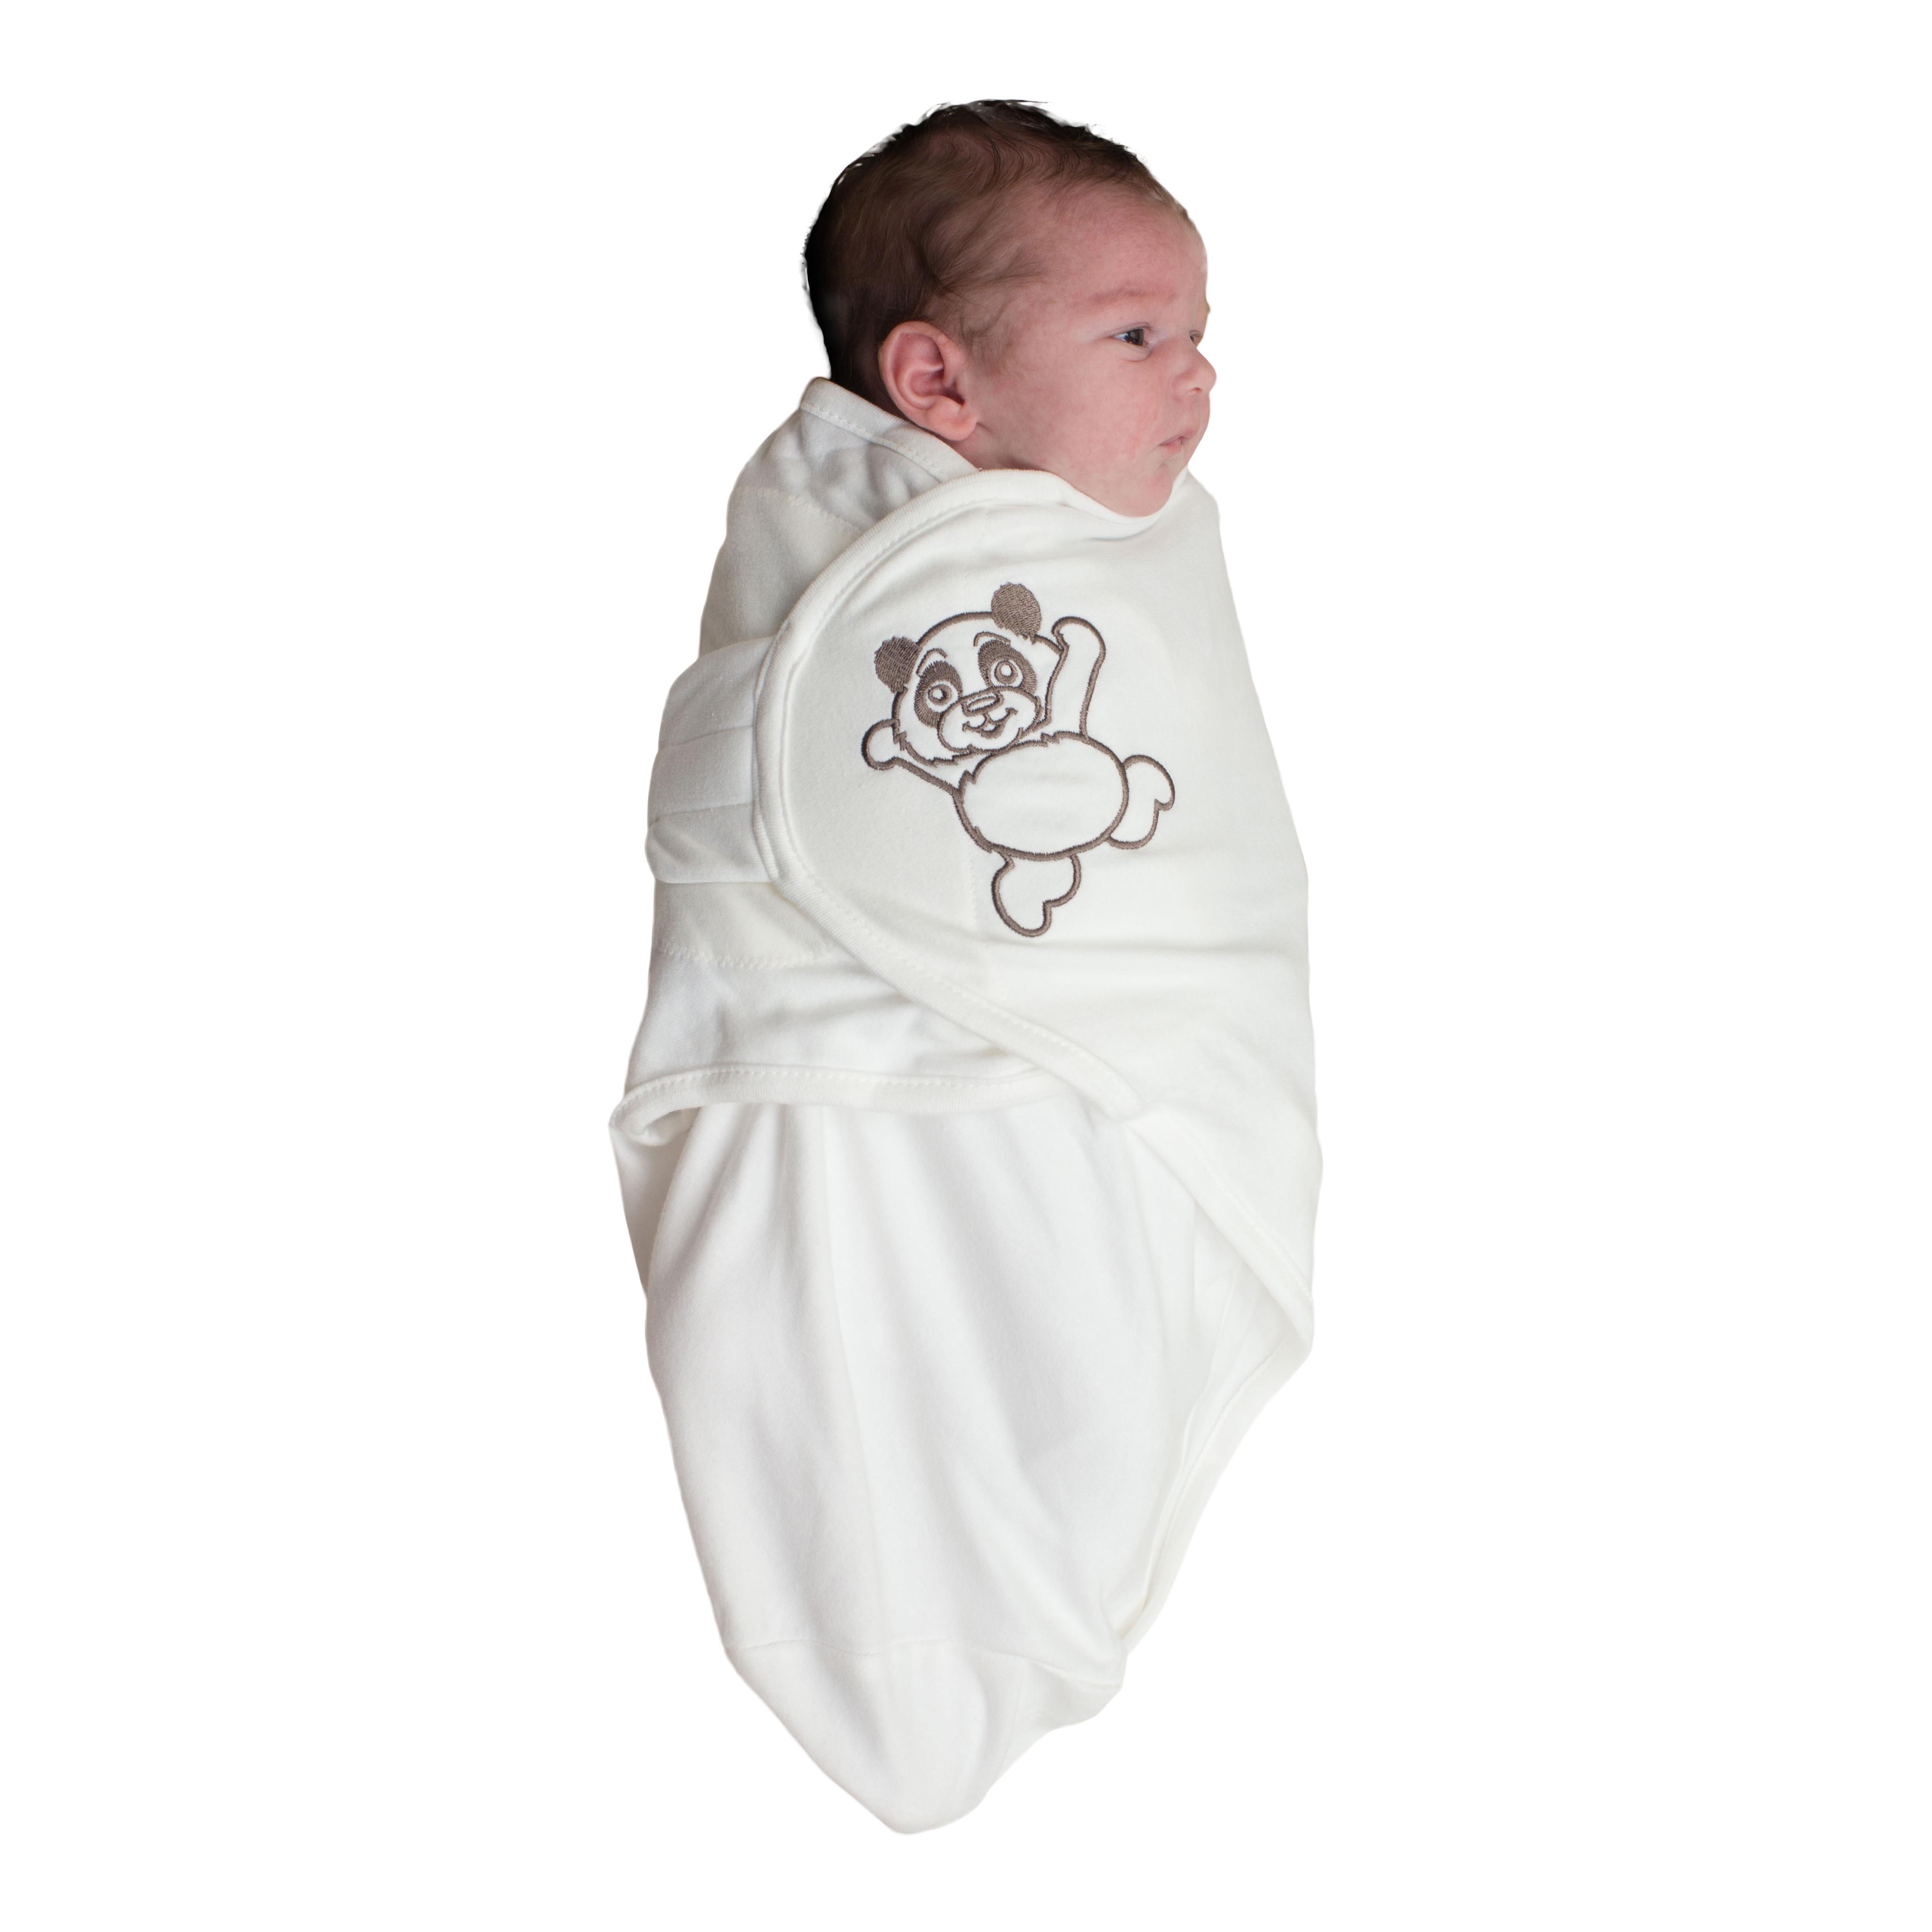 310beb54622 B-Wrap Wikkeldeken van Bo Jungle kopen? Bambino Baby & Kidsstore